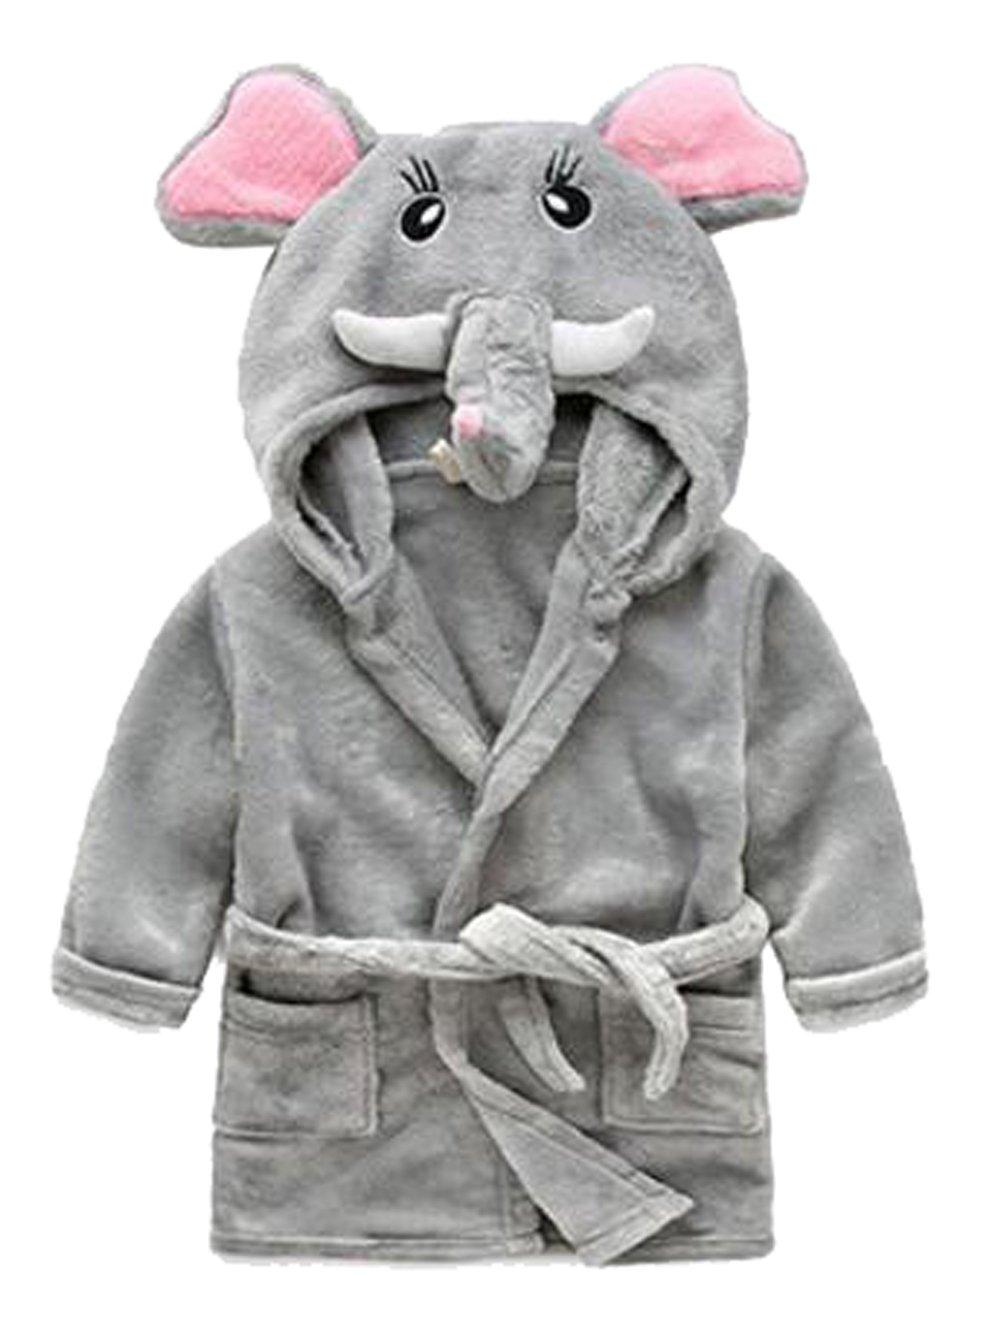 25350181c Galleon - Toddler Kids Cartoon Hooded Plush Robe Animal Pajamas ...